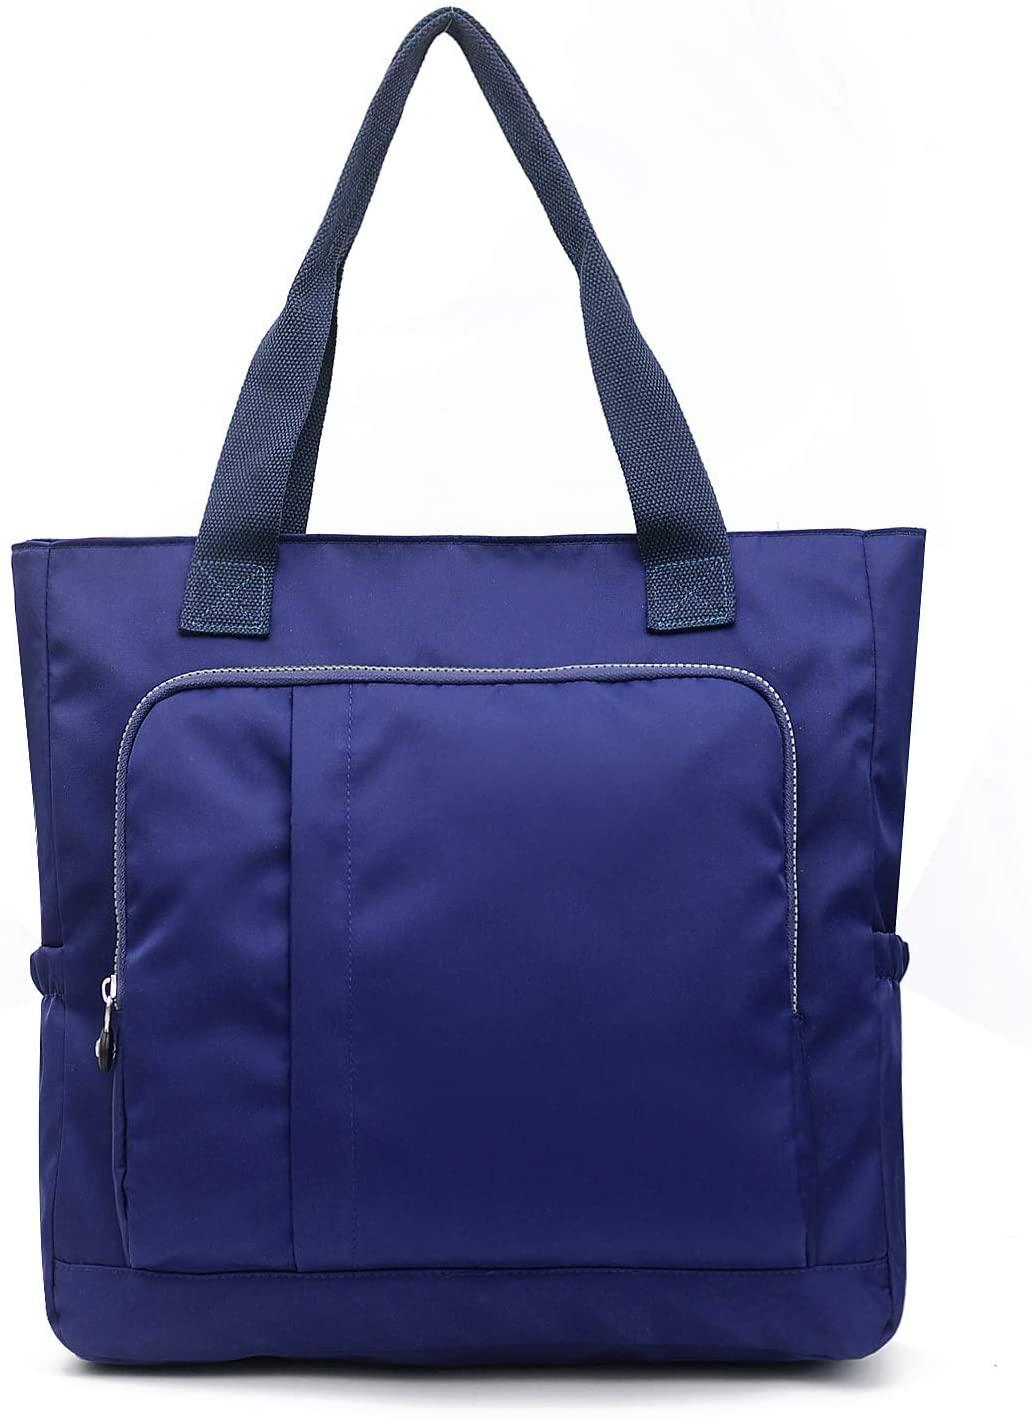 Big Waterproof Lightweight Nylon Tote Handbag Top Zipper Shoulder Bag for Work Travel Daily Shopping Gym Beach (Blue)